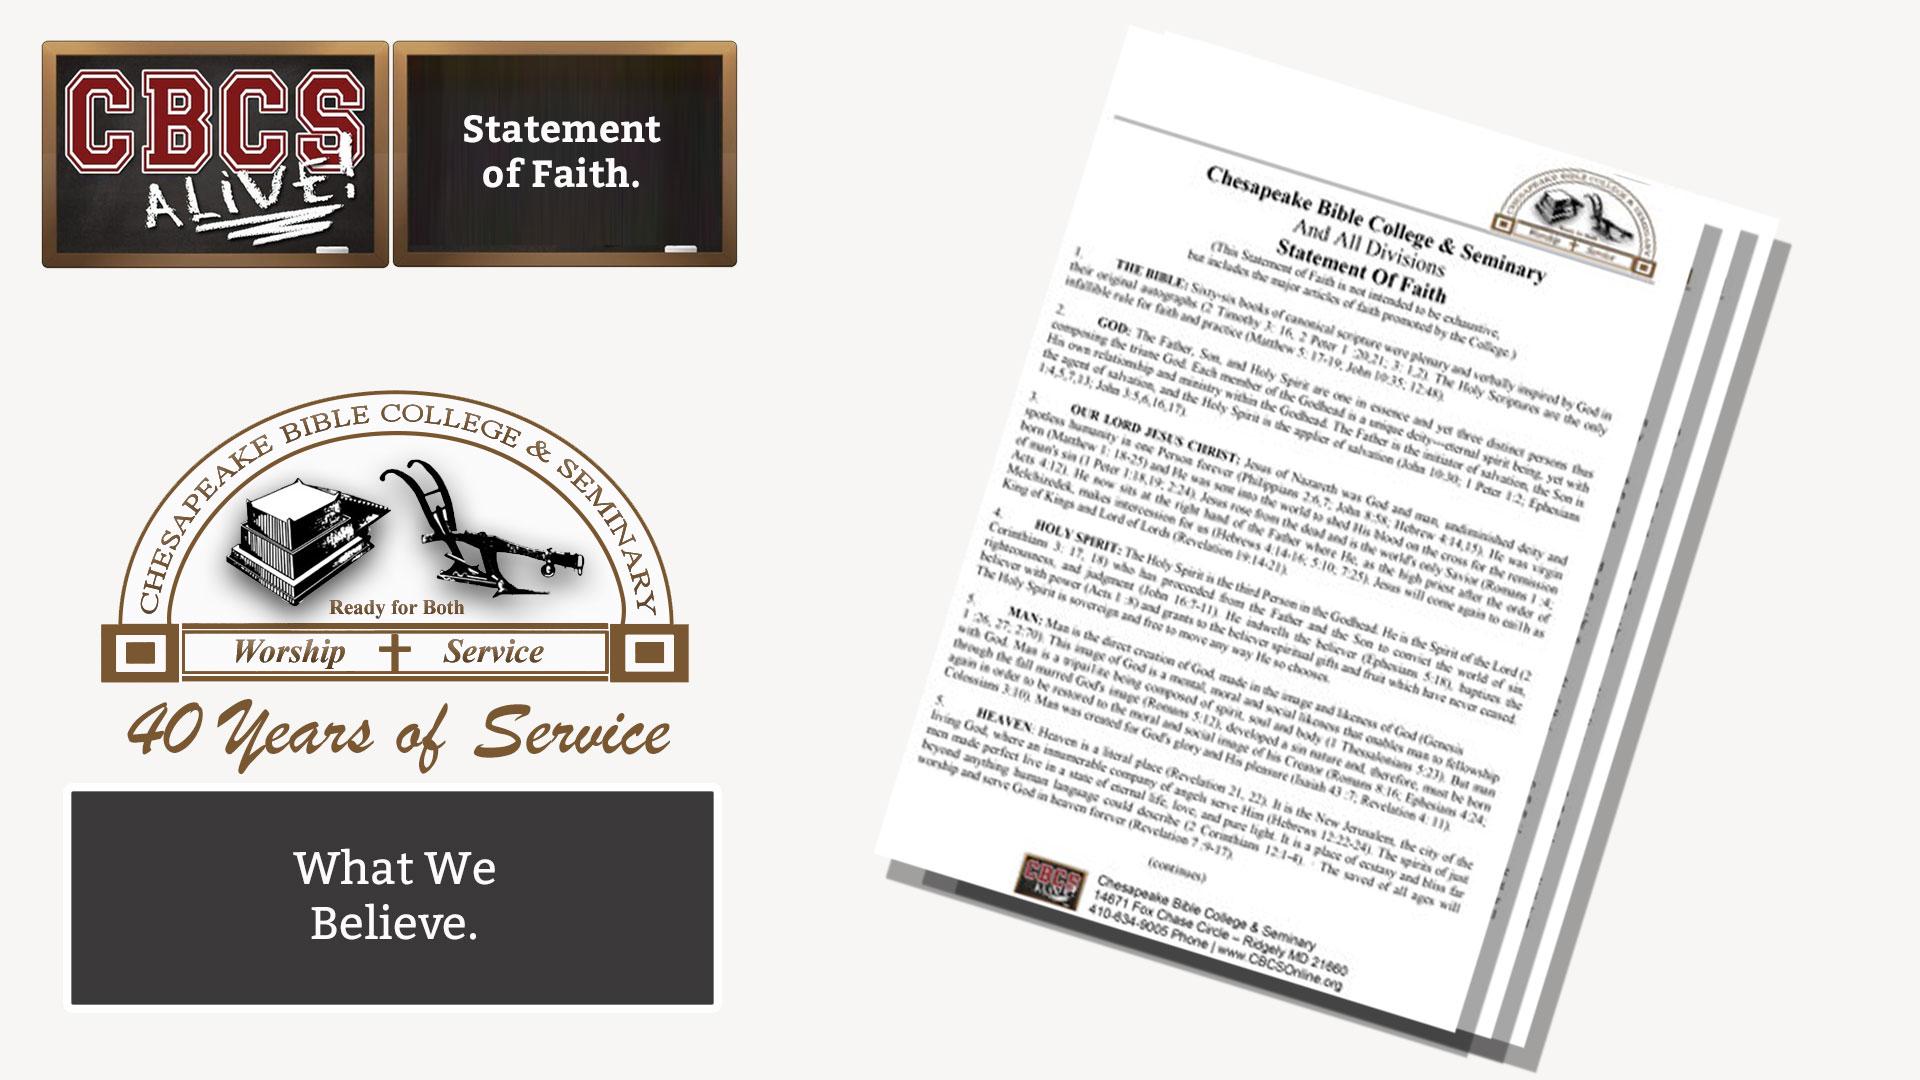 Chesapeake Bible College & Seminary - Statement of Faith